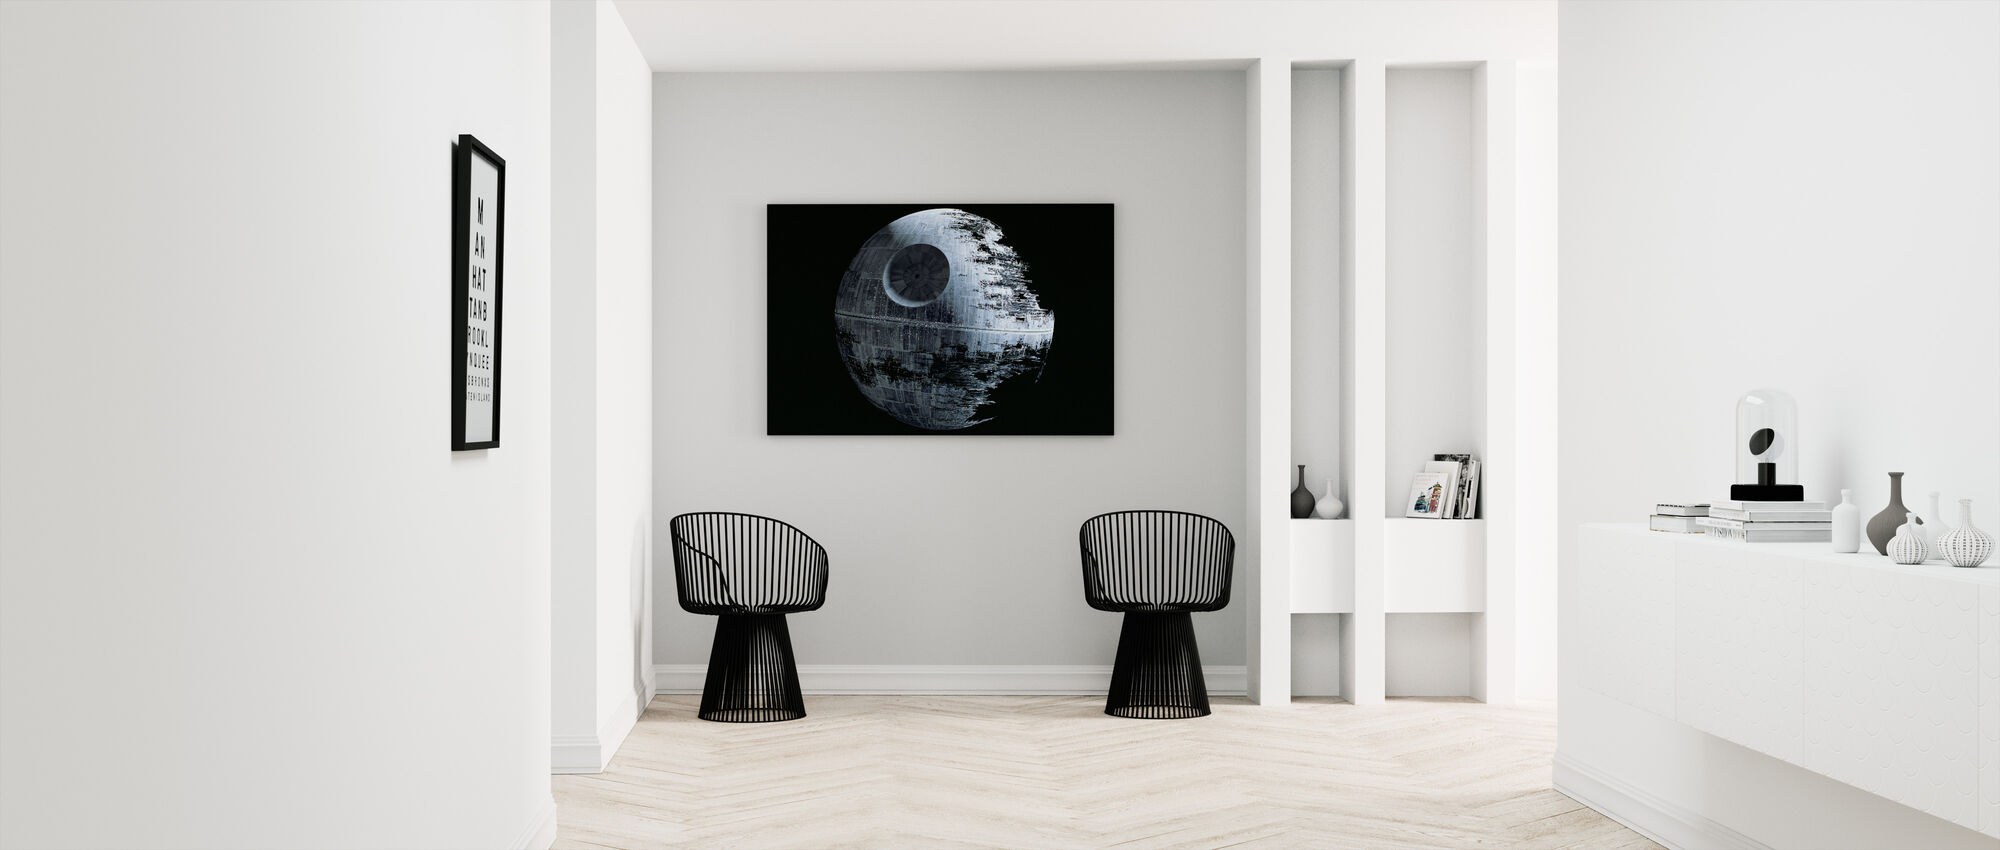 Star Wars - Death Star 2 - Canvastavla - Hall